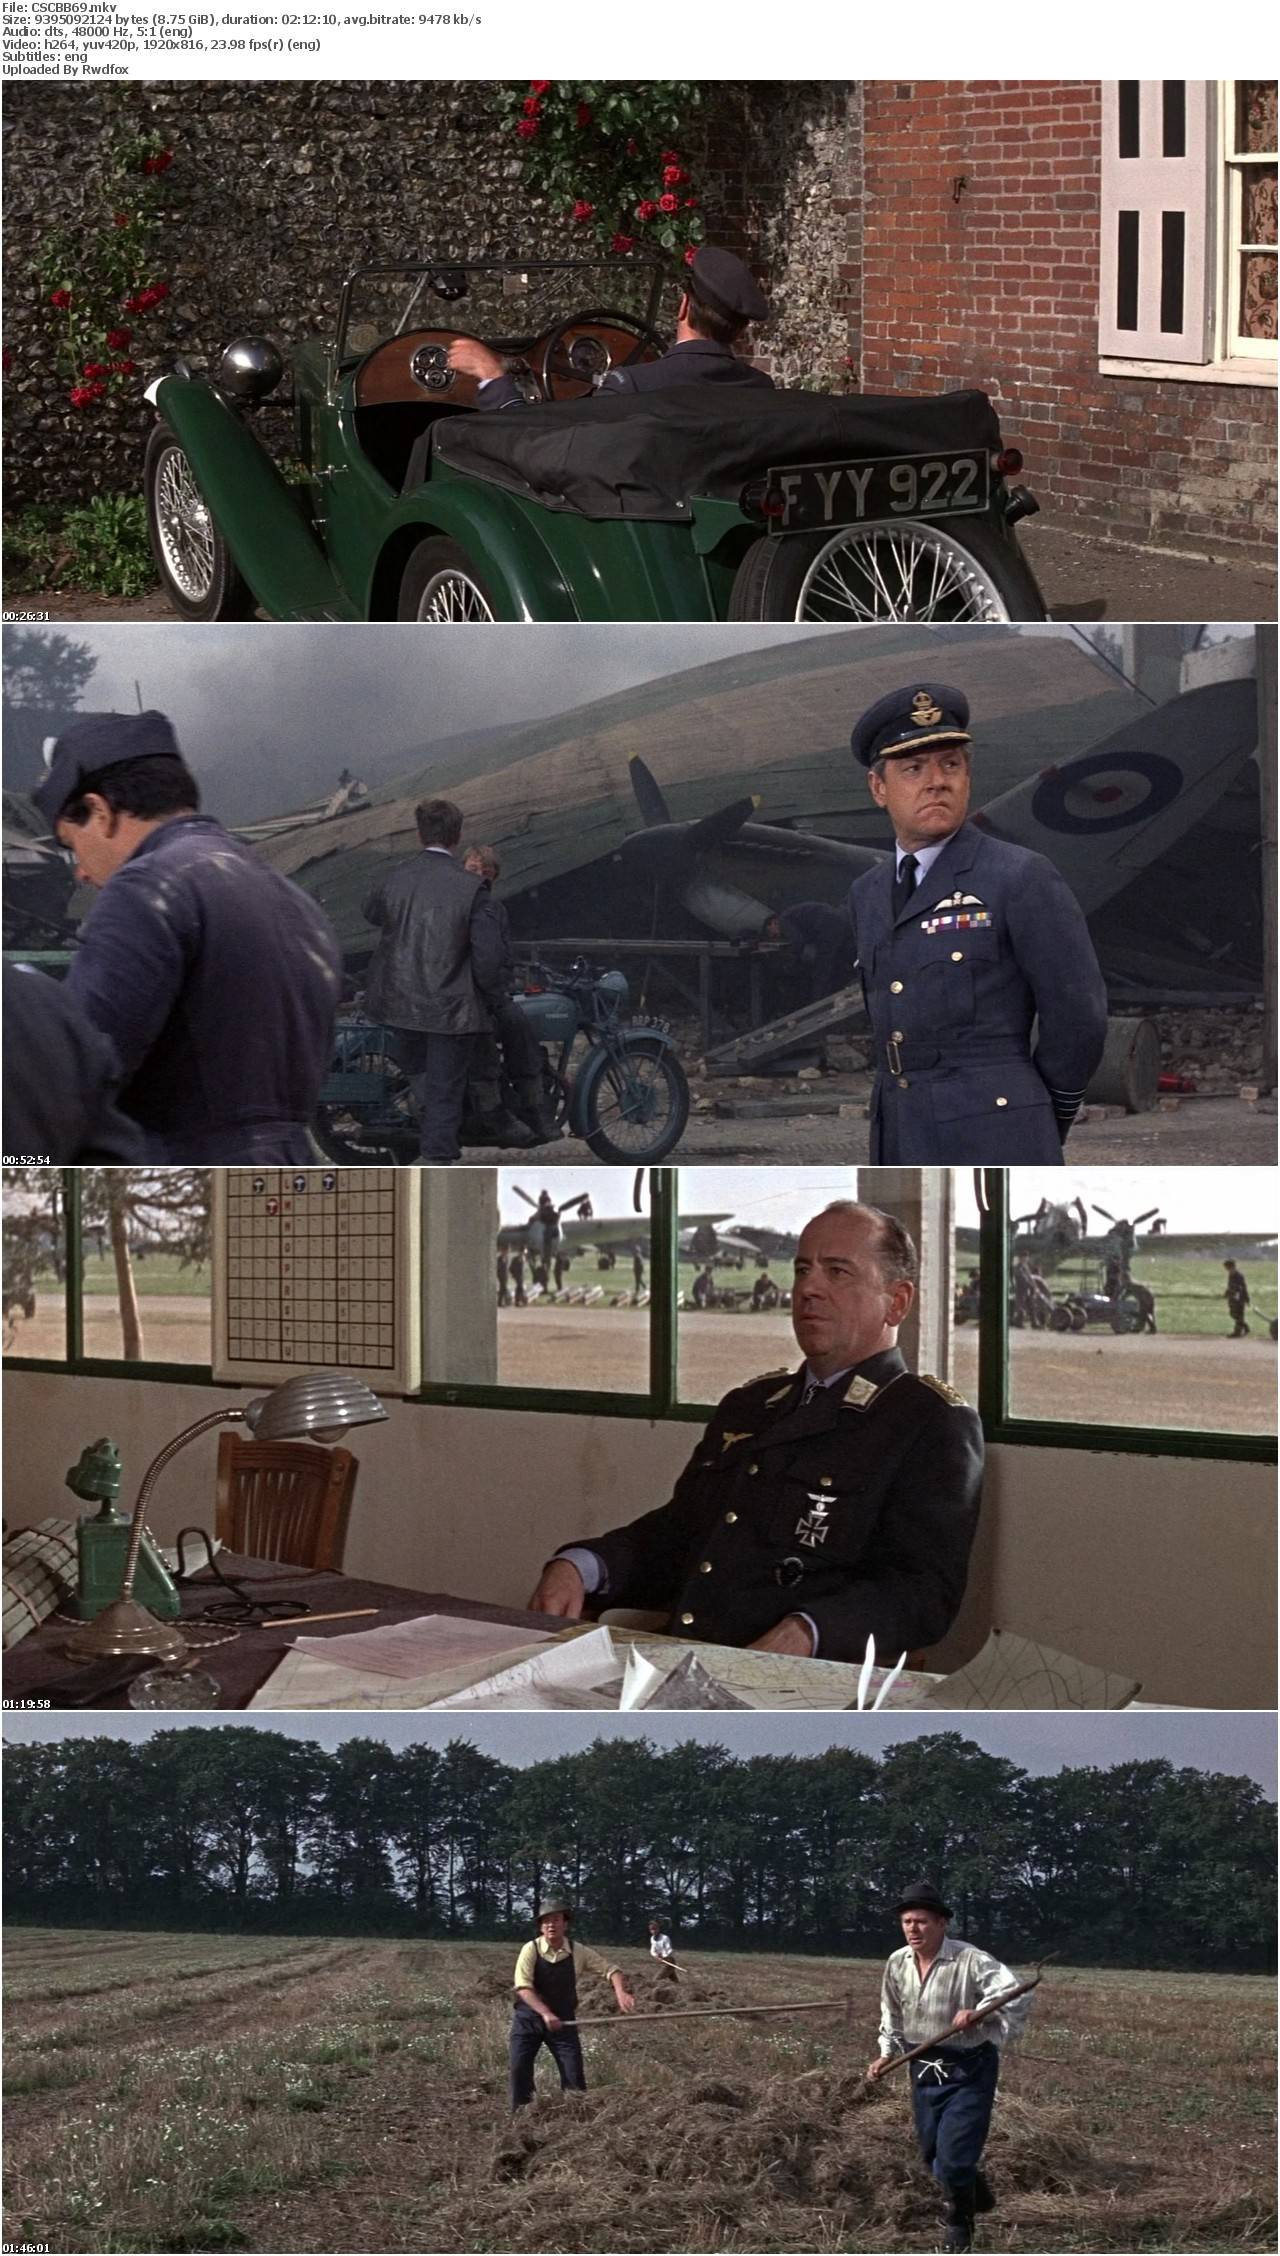 Battle of Britain (1969)